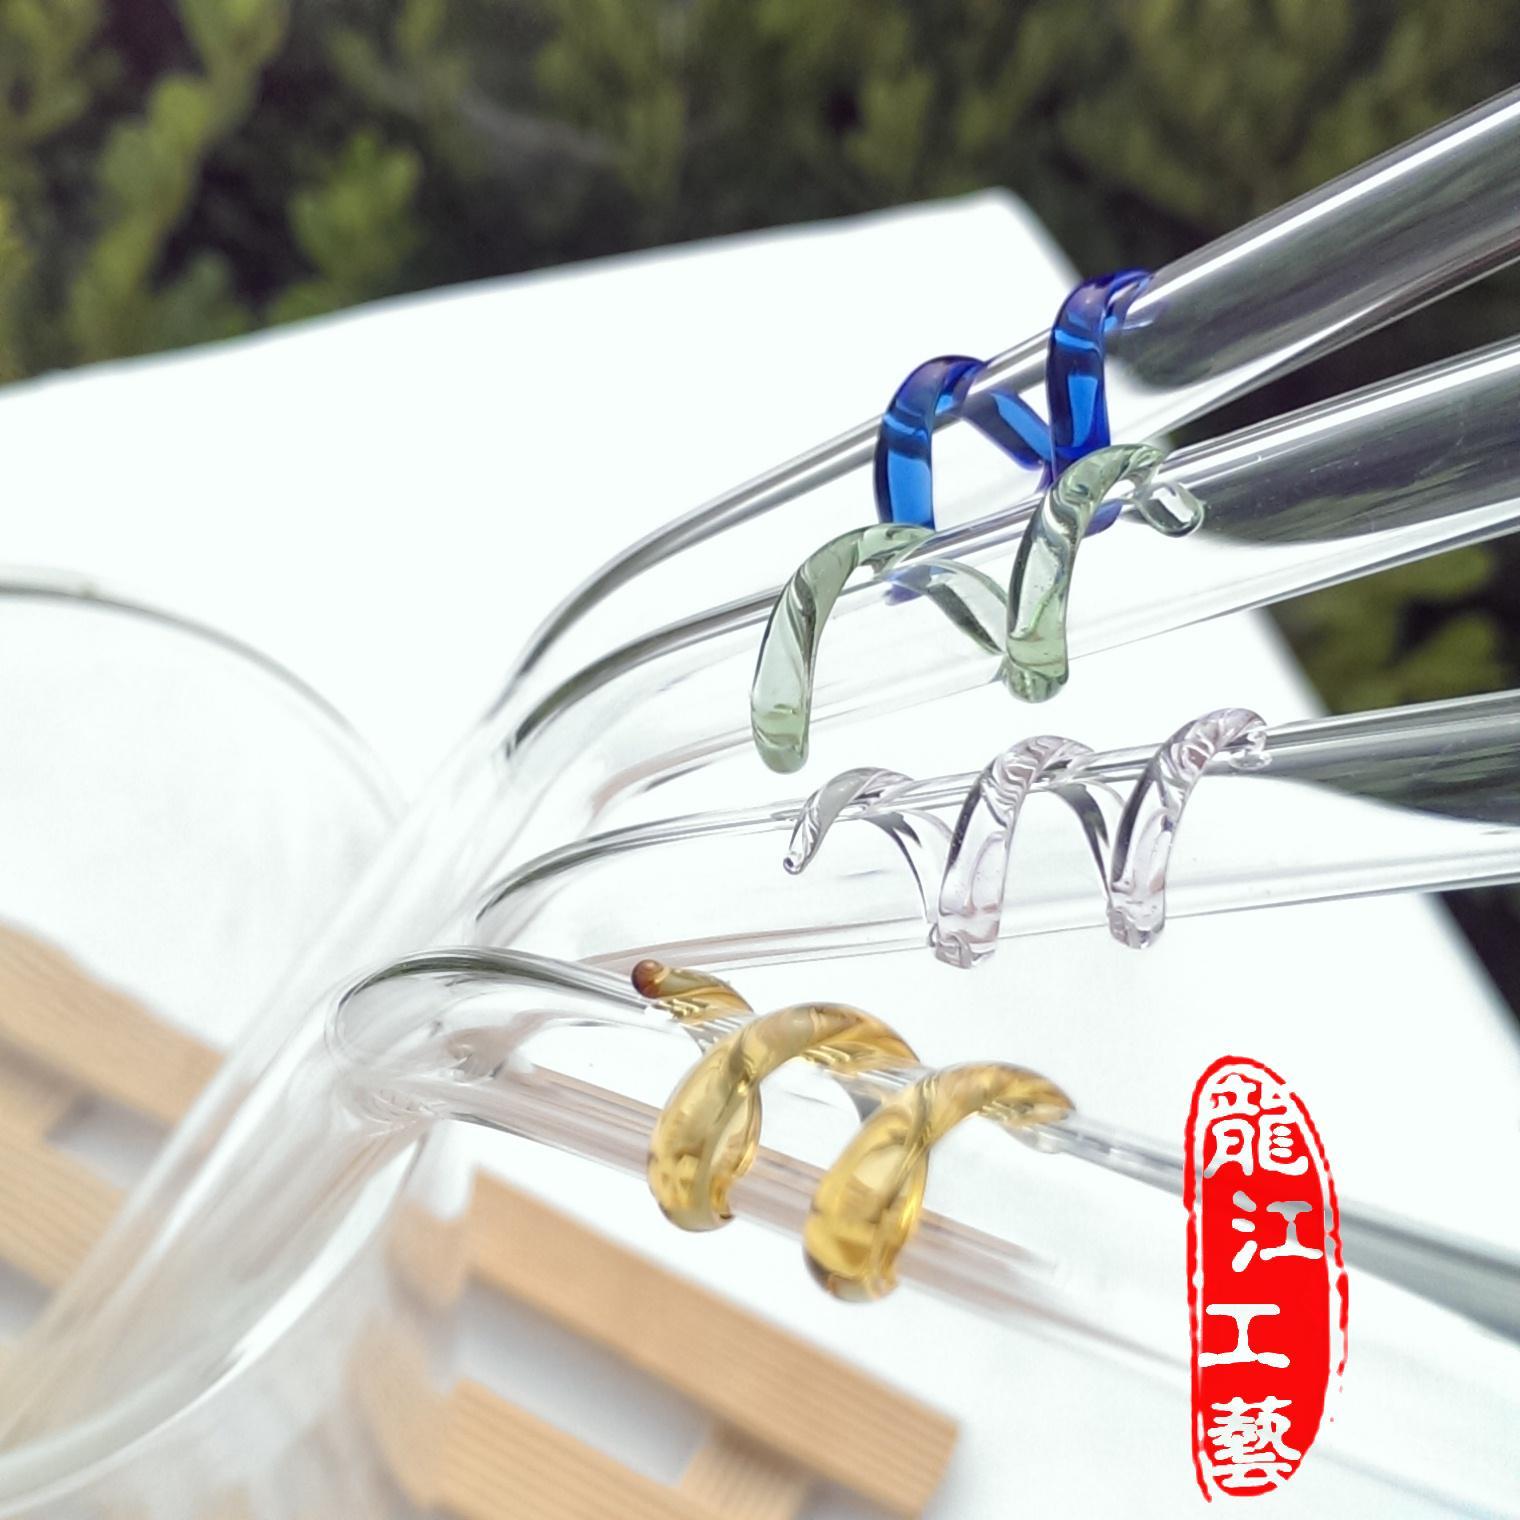 O.RoseLif Handmade Glass Pipette Fruit Juice Circle Multicolour Suckpipe Drinking Straws Milk Tea Bar Bending Loops Straw